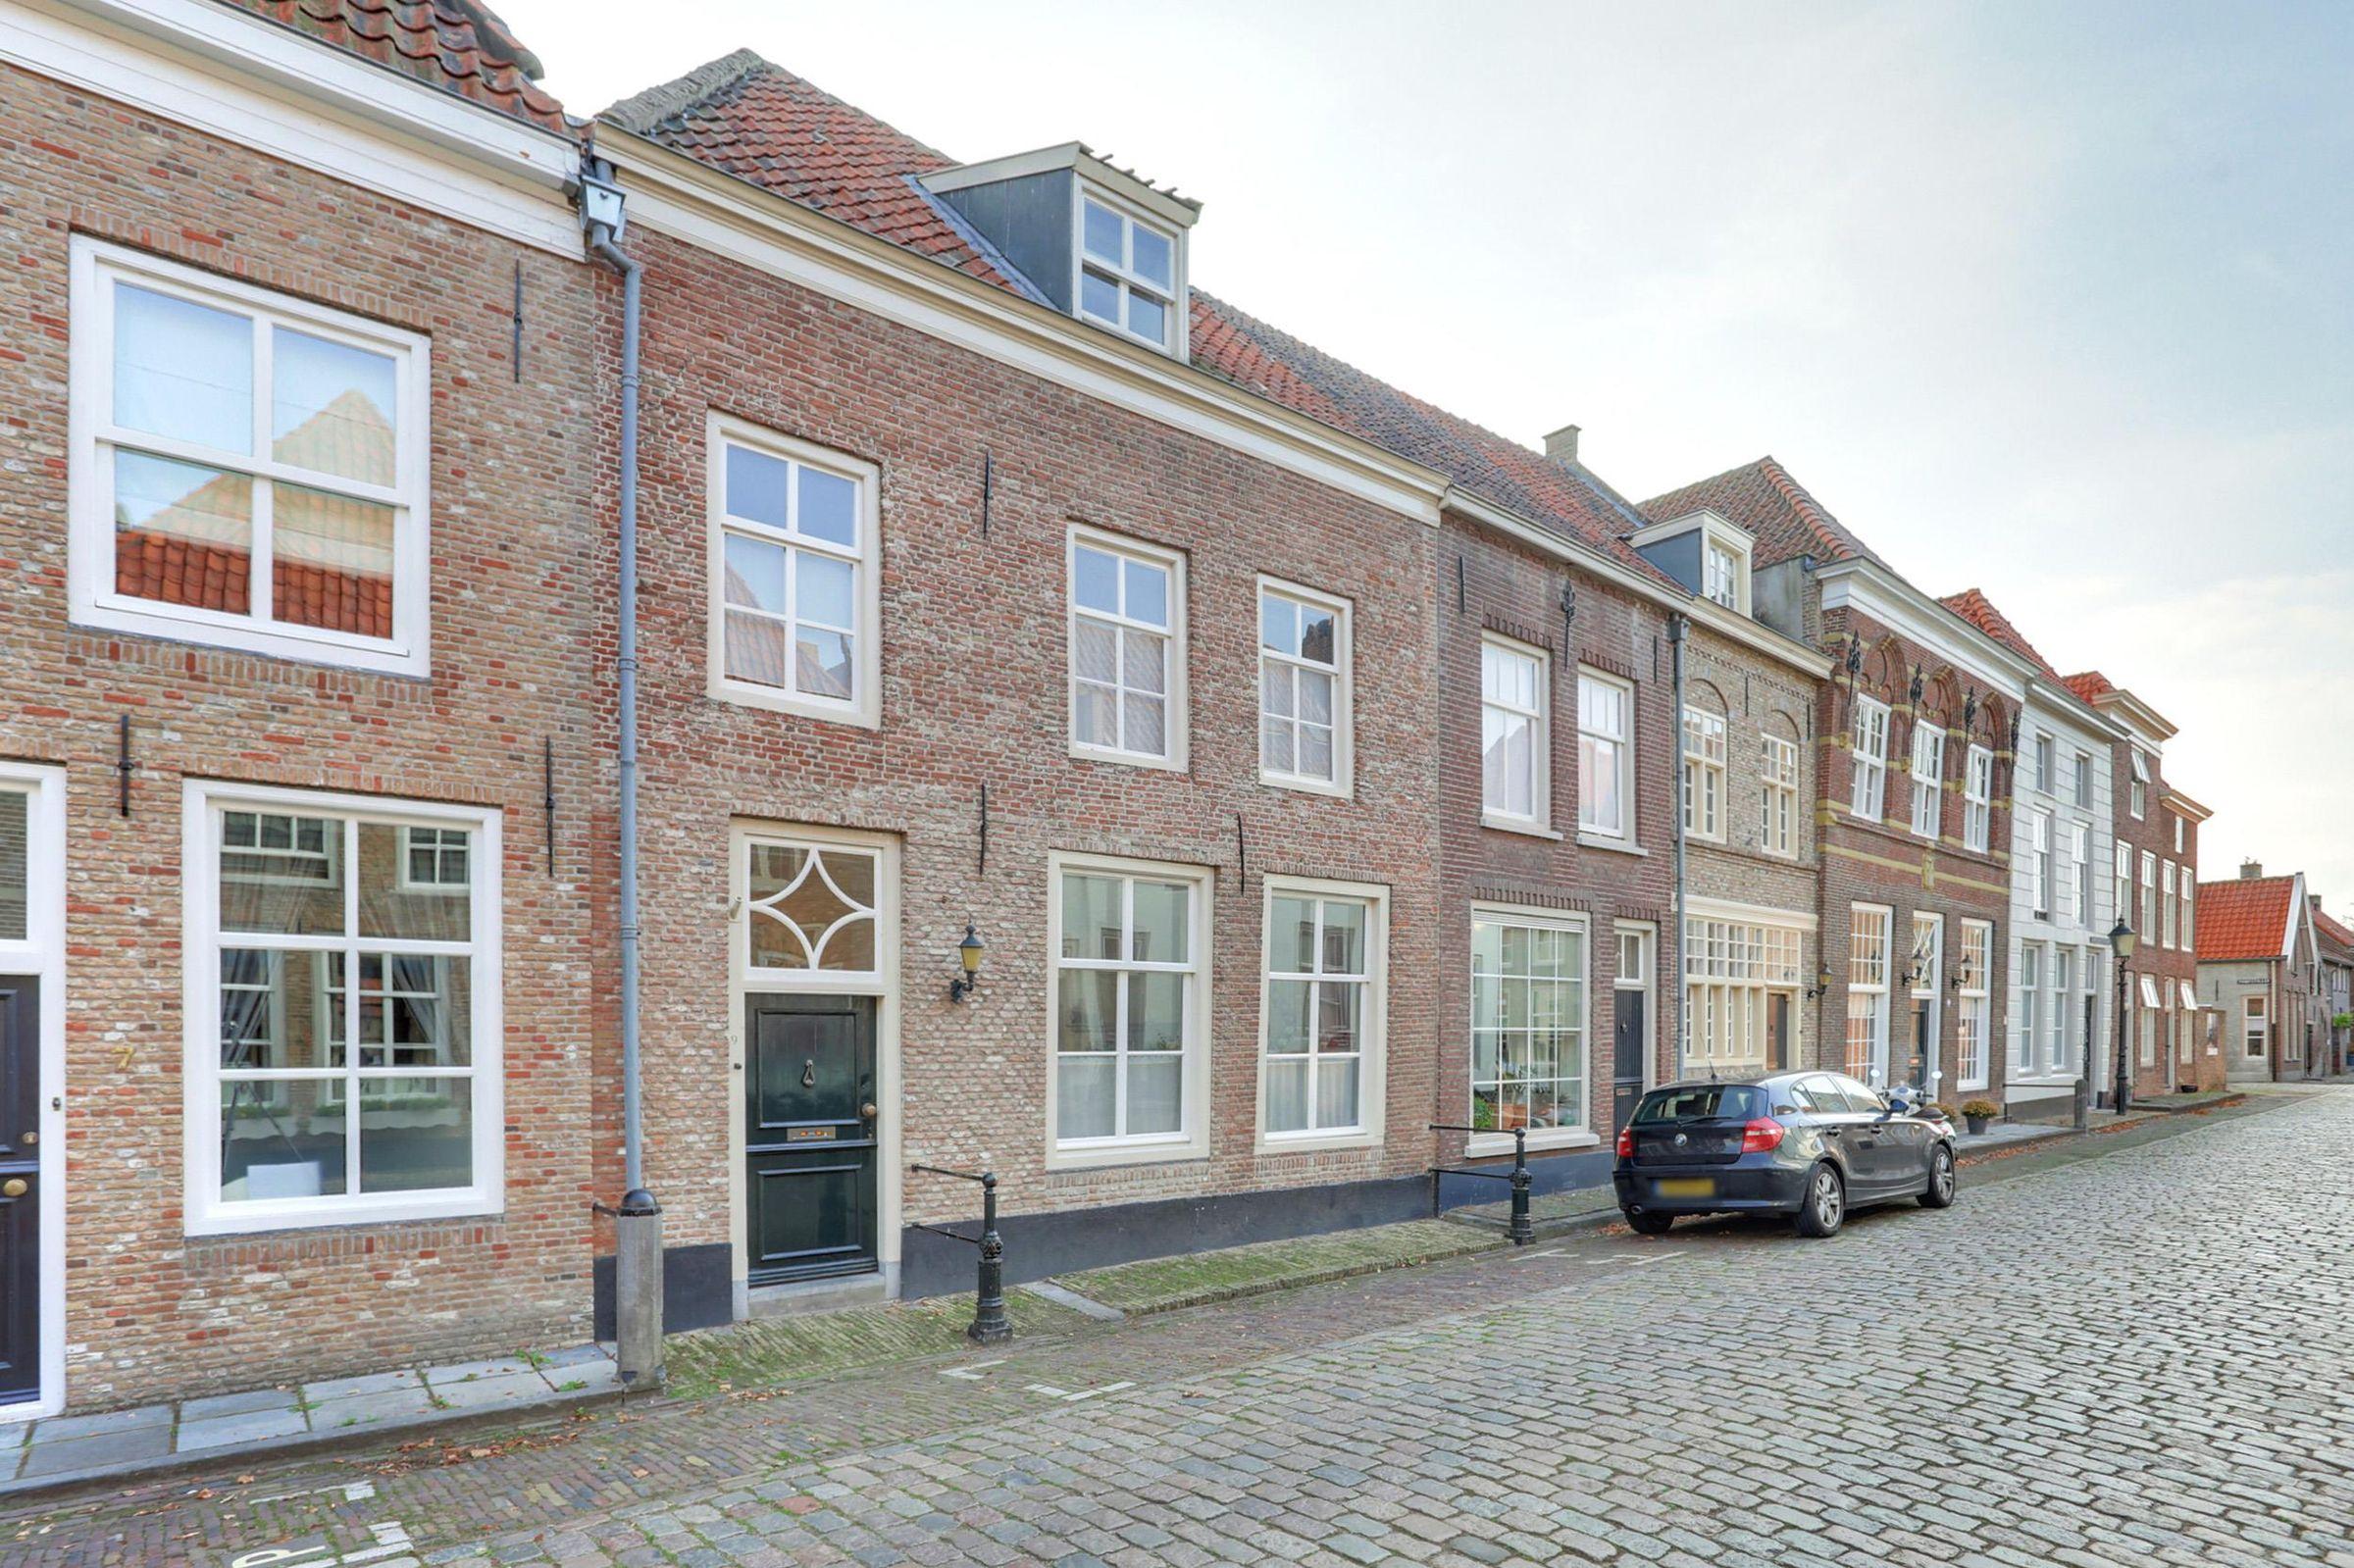 Oudheusdensestraat 9, Heusden